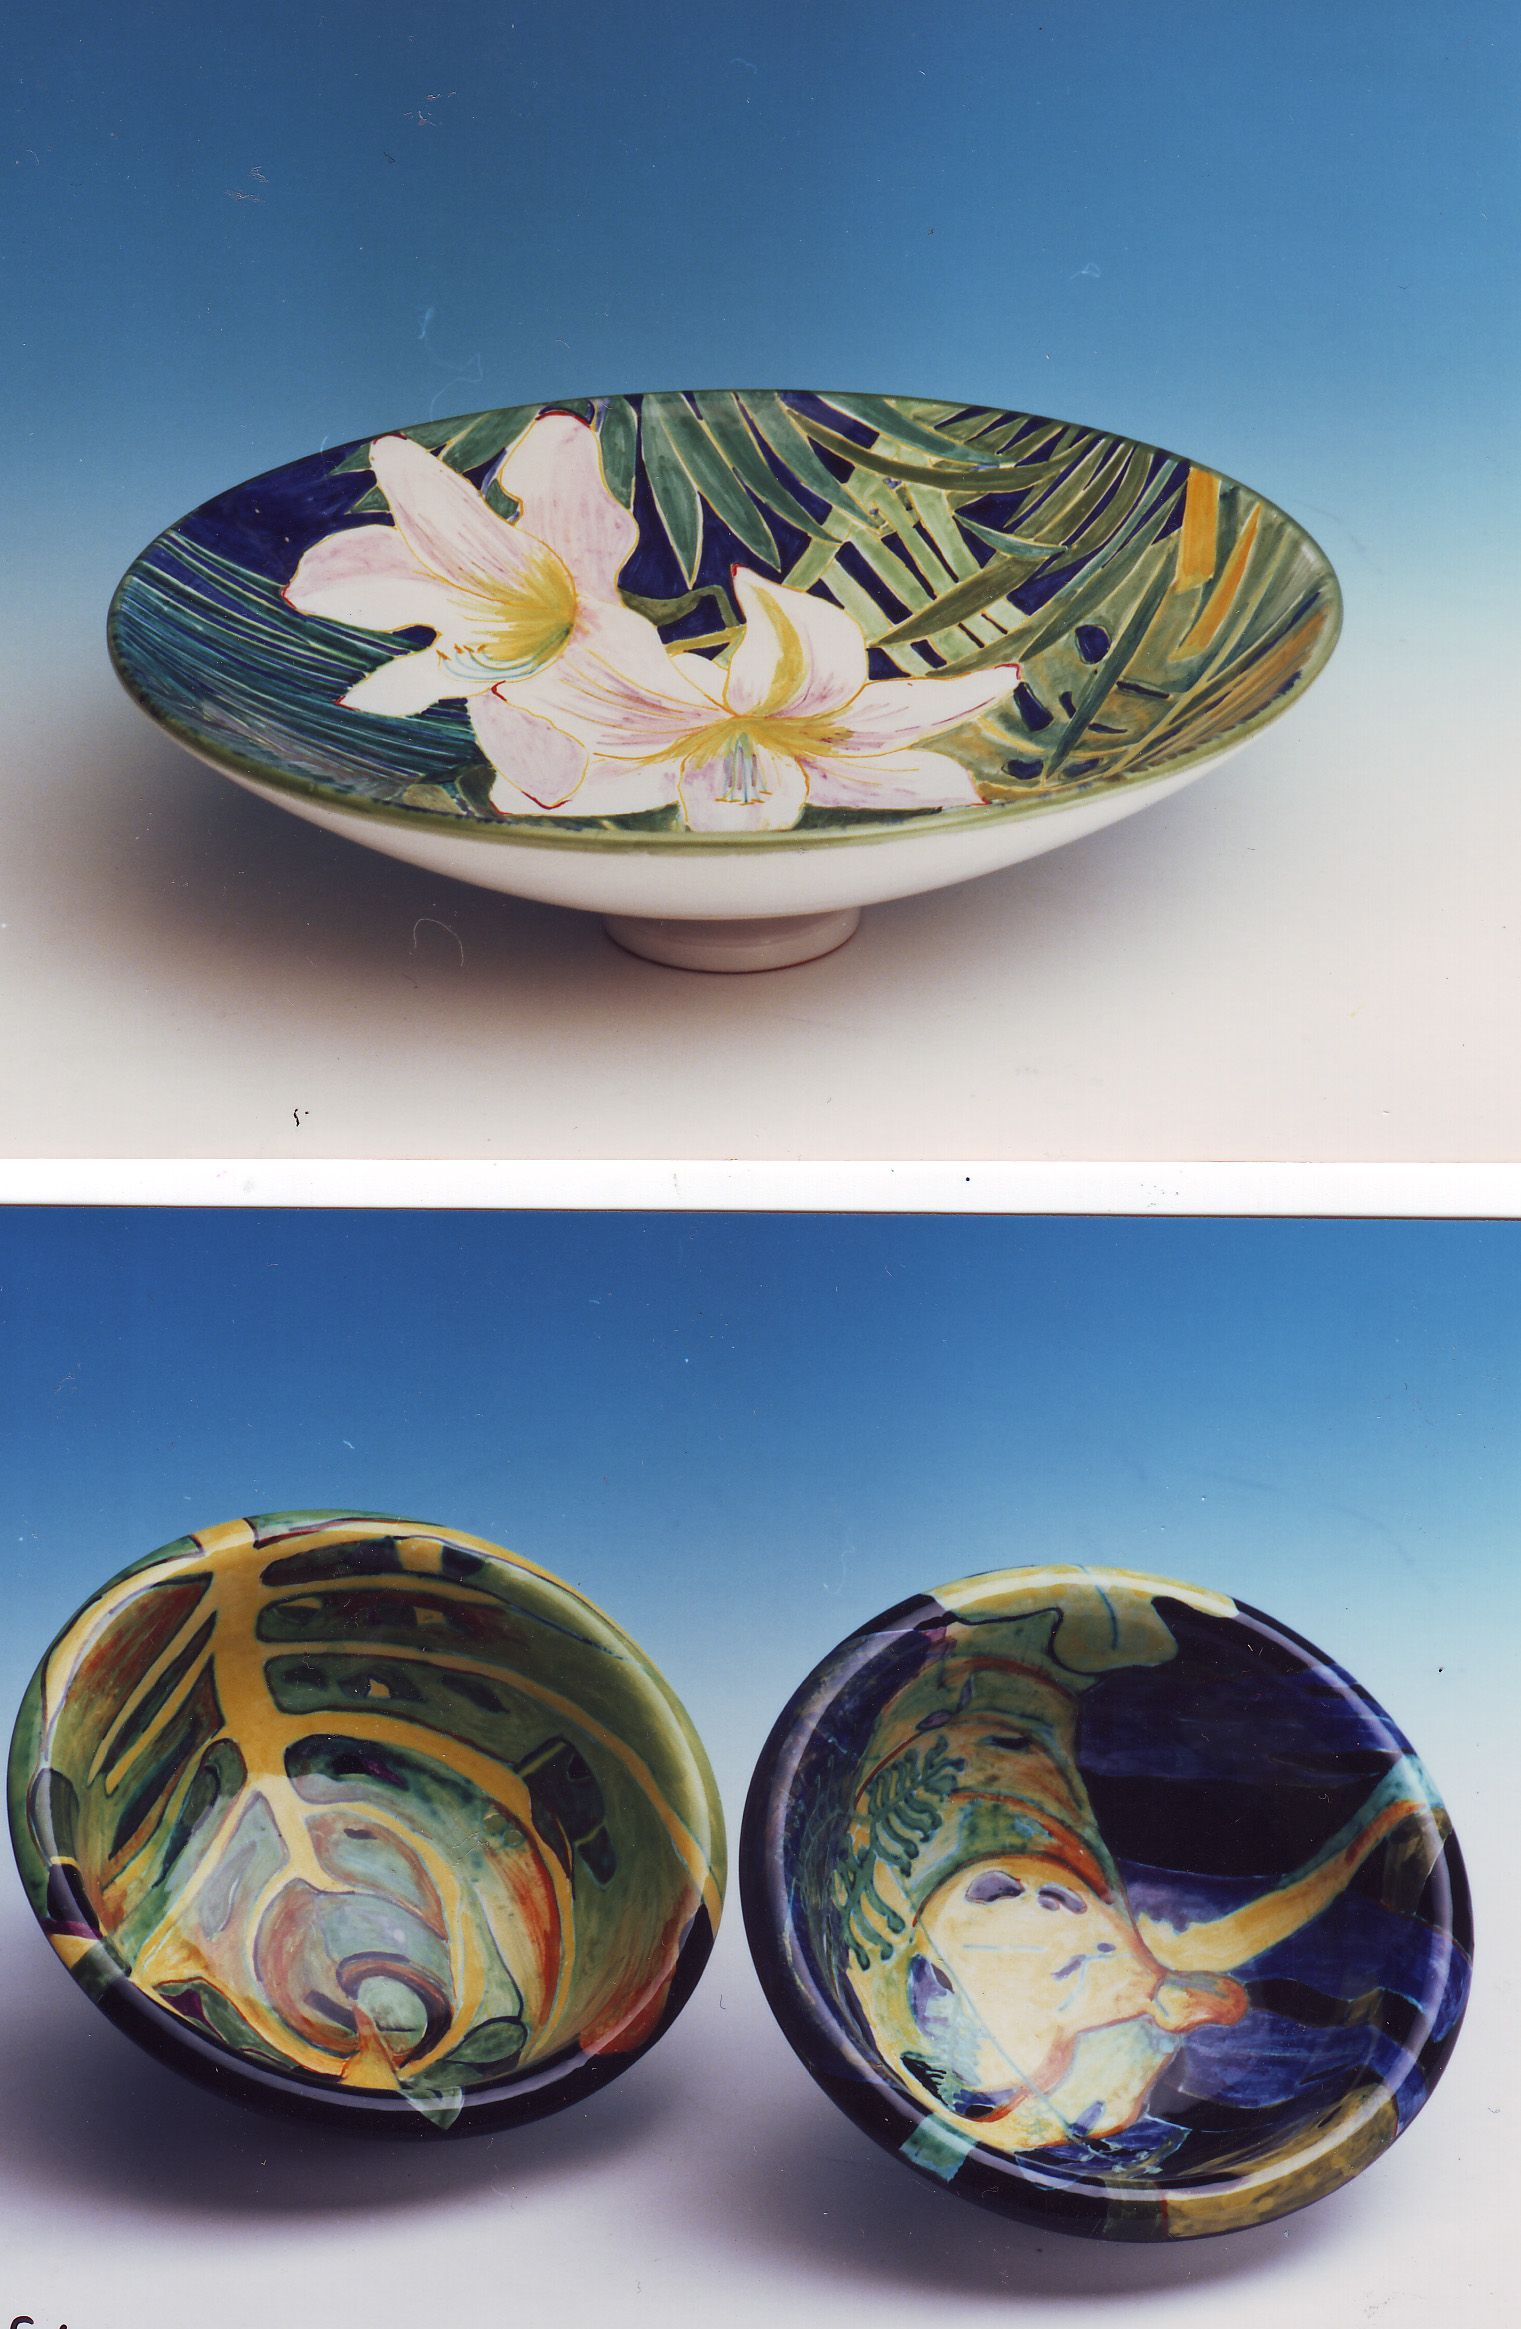 Three Bowls Designed Handpainted In Deruta Italy For Ubaldo Grazia By Mopokeowl Australia Bowl Designs Decorative Bowls Bowl